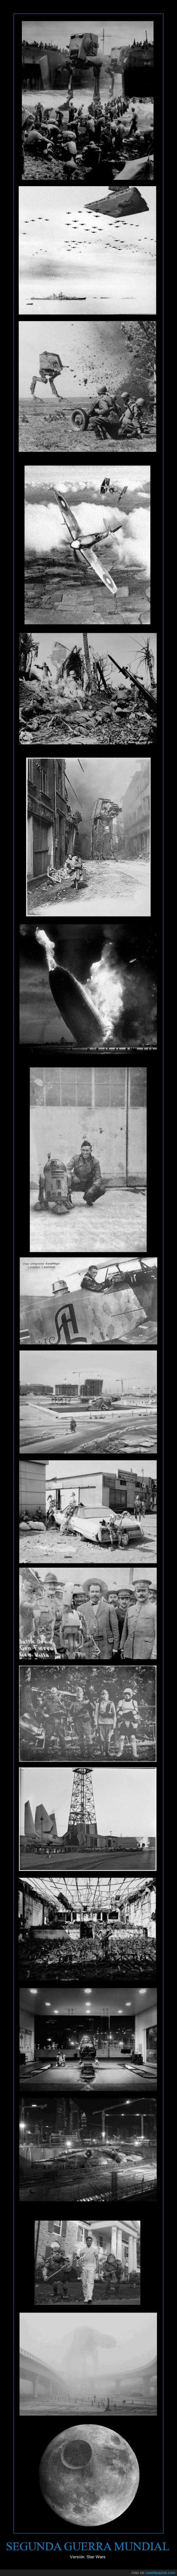 antiguo,montaje,segunda guerra mundial,star wars,WWII